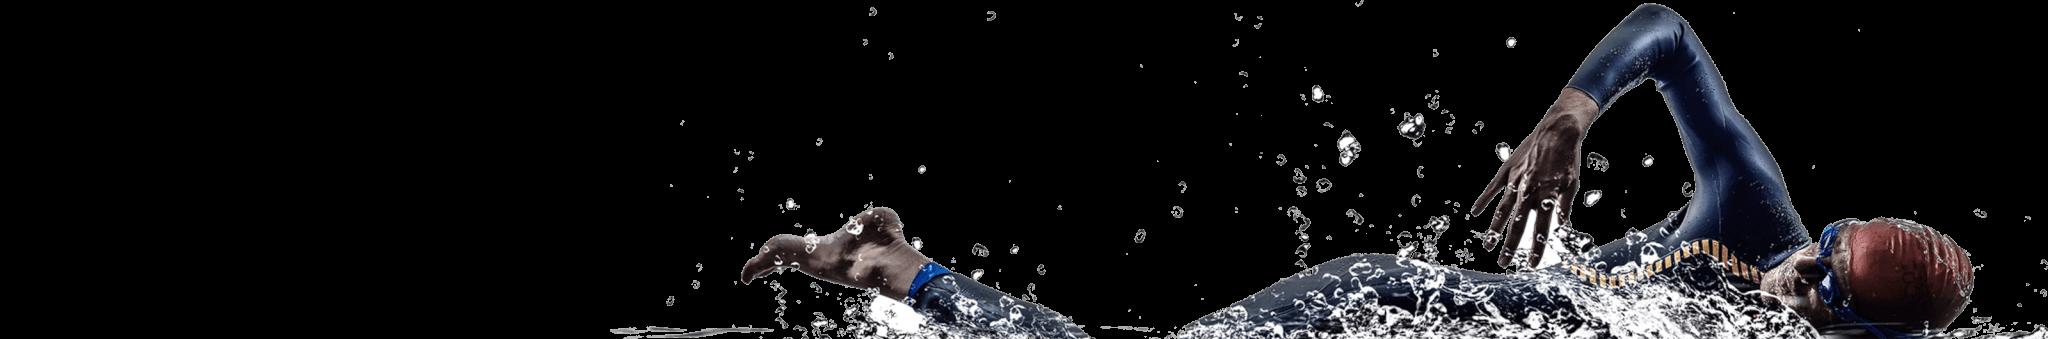 http://mogaac.hu/wp-content/uploads/2017/10/inner_swimmer.png